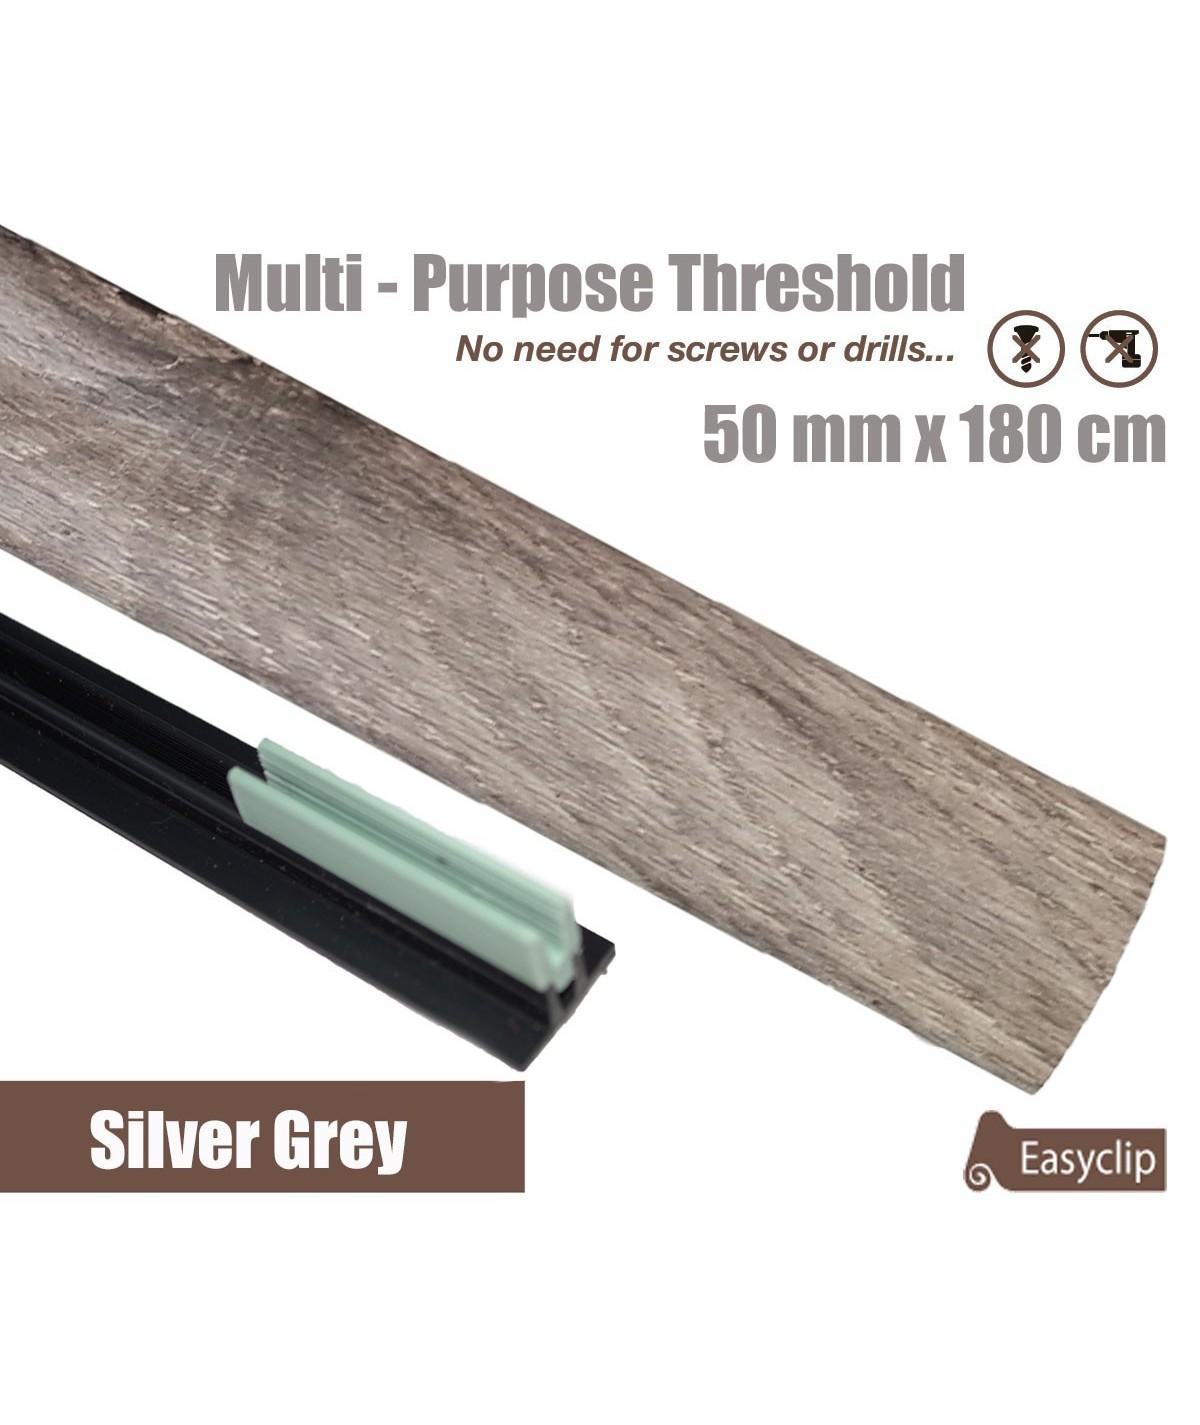 Silver Grey Laminated Transition Threshold Strip  50mm x180cm Multi-Height/Pivots